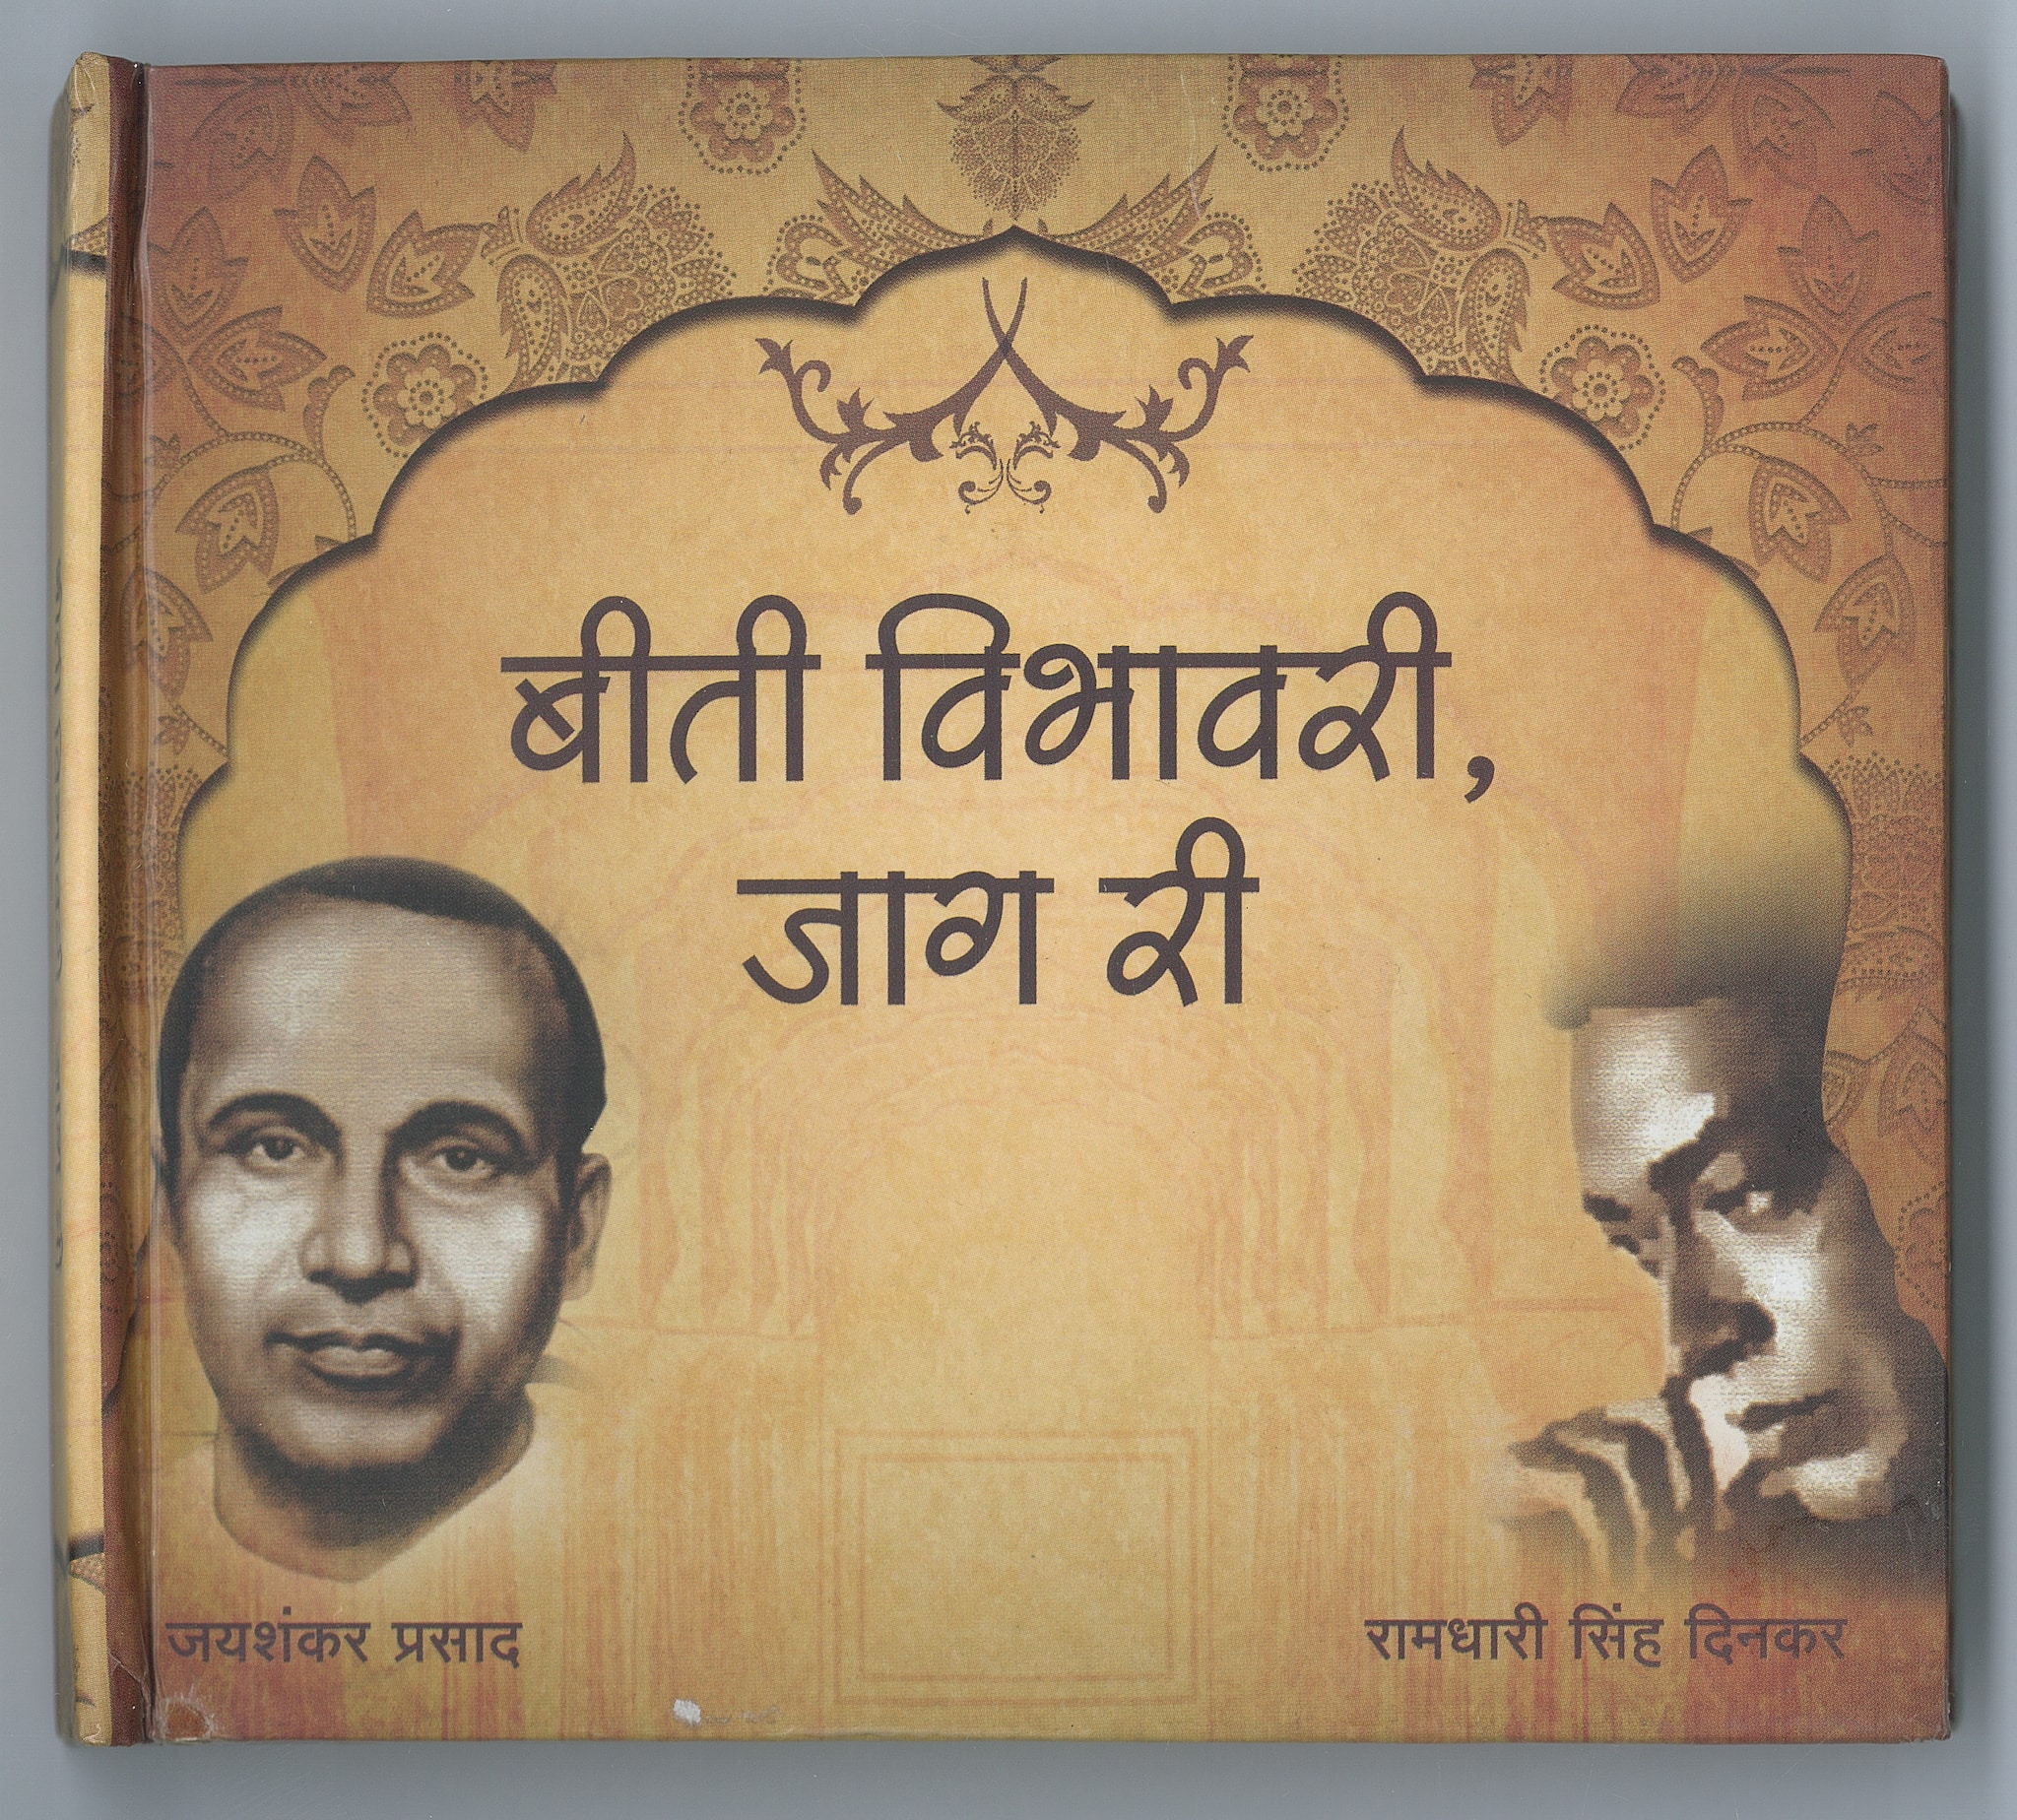 Cover of audio CD on poets Ramdhari Singh 'Dinkar' and Jaishankar Prasad.